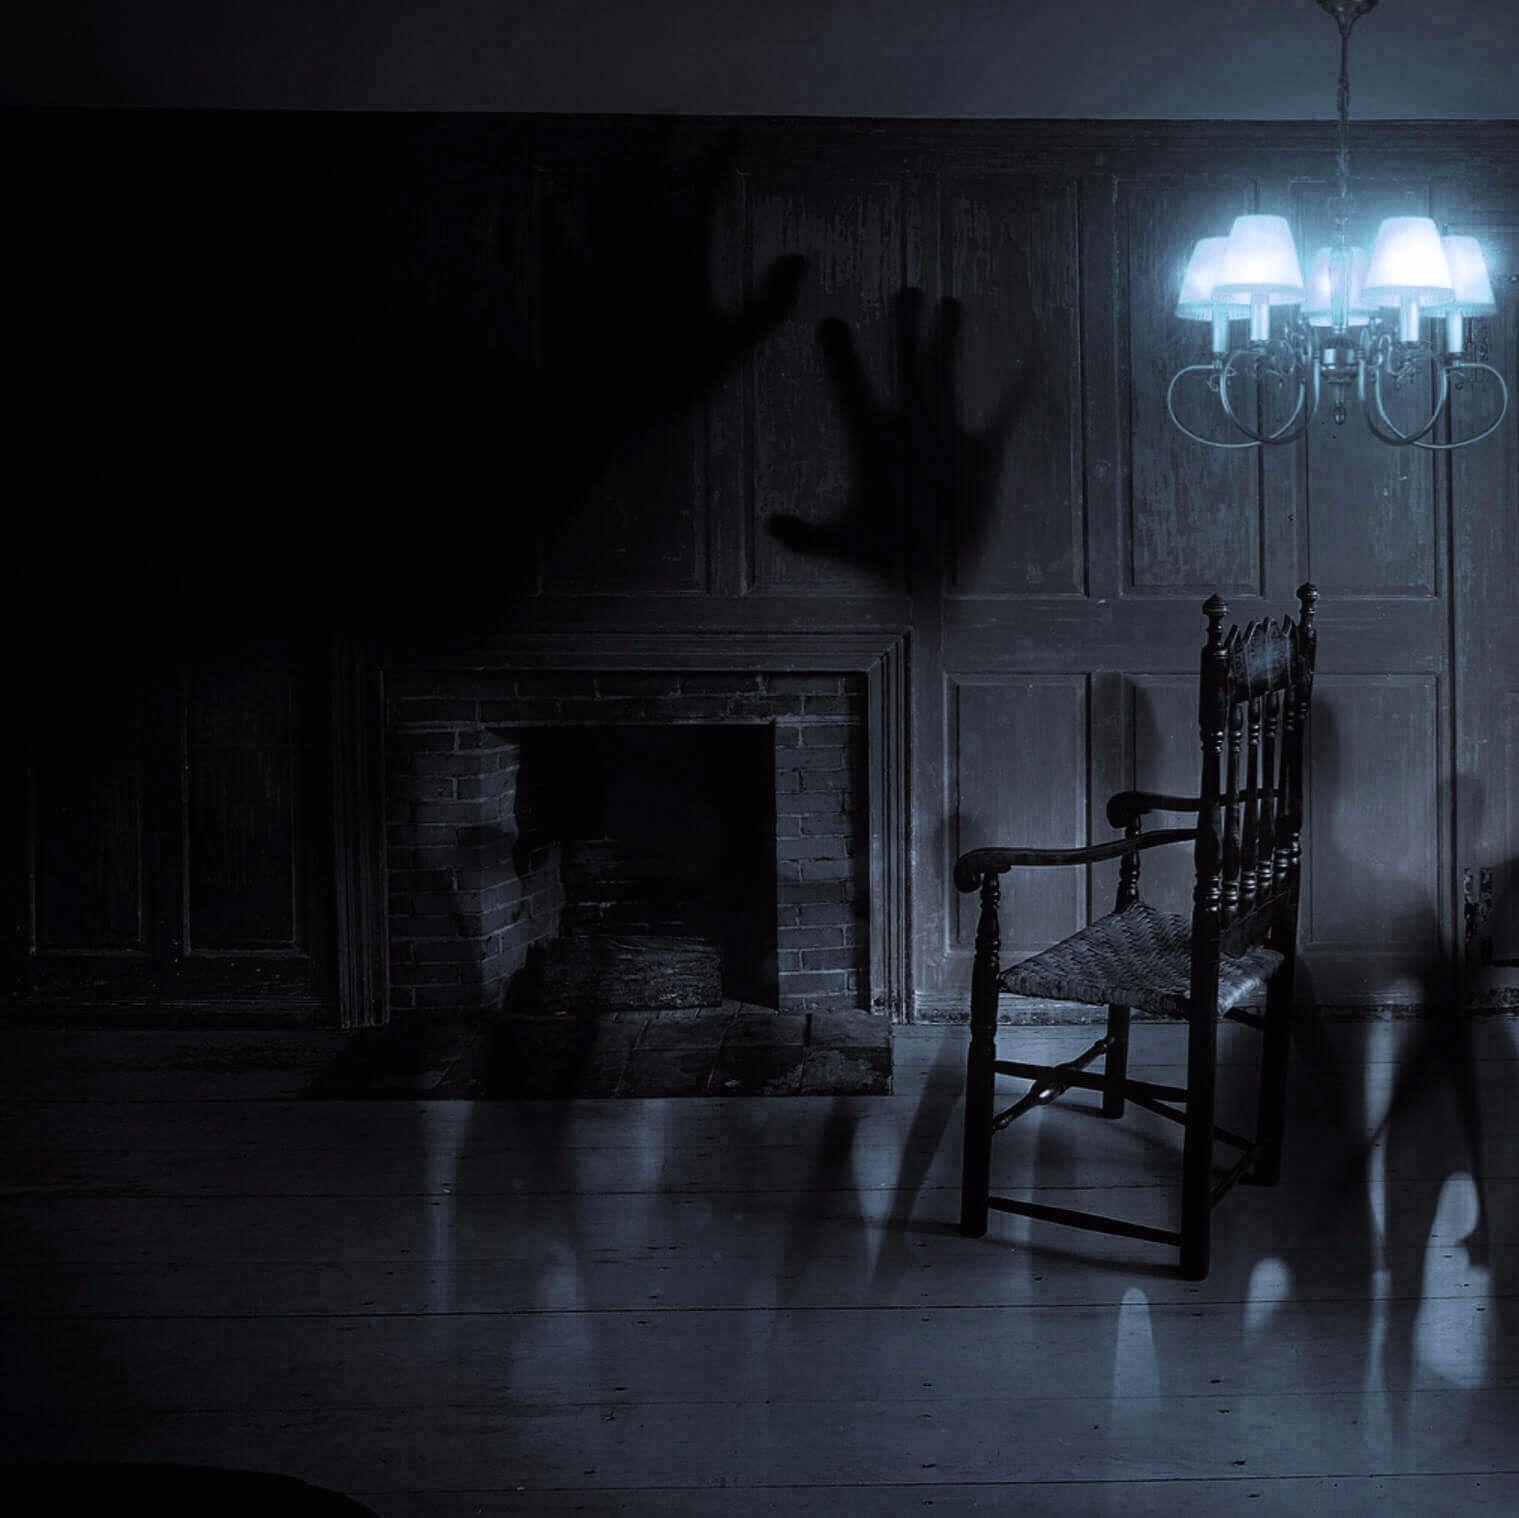 ghosts-gespenter-spooky-horror-407486666.jpg